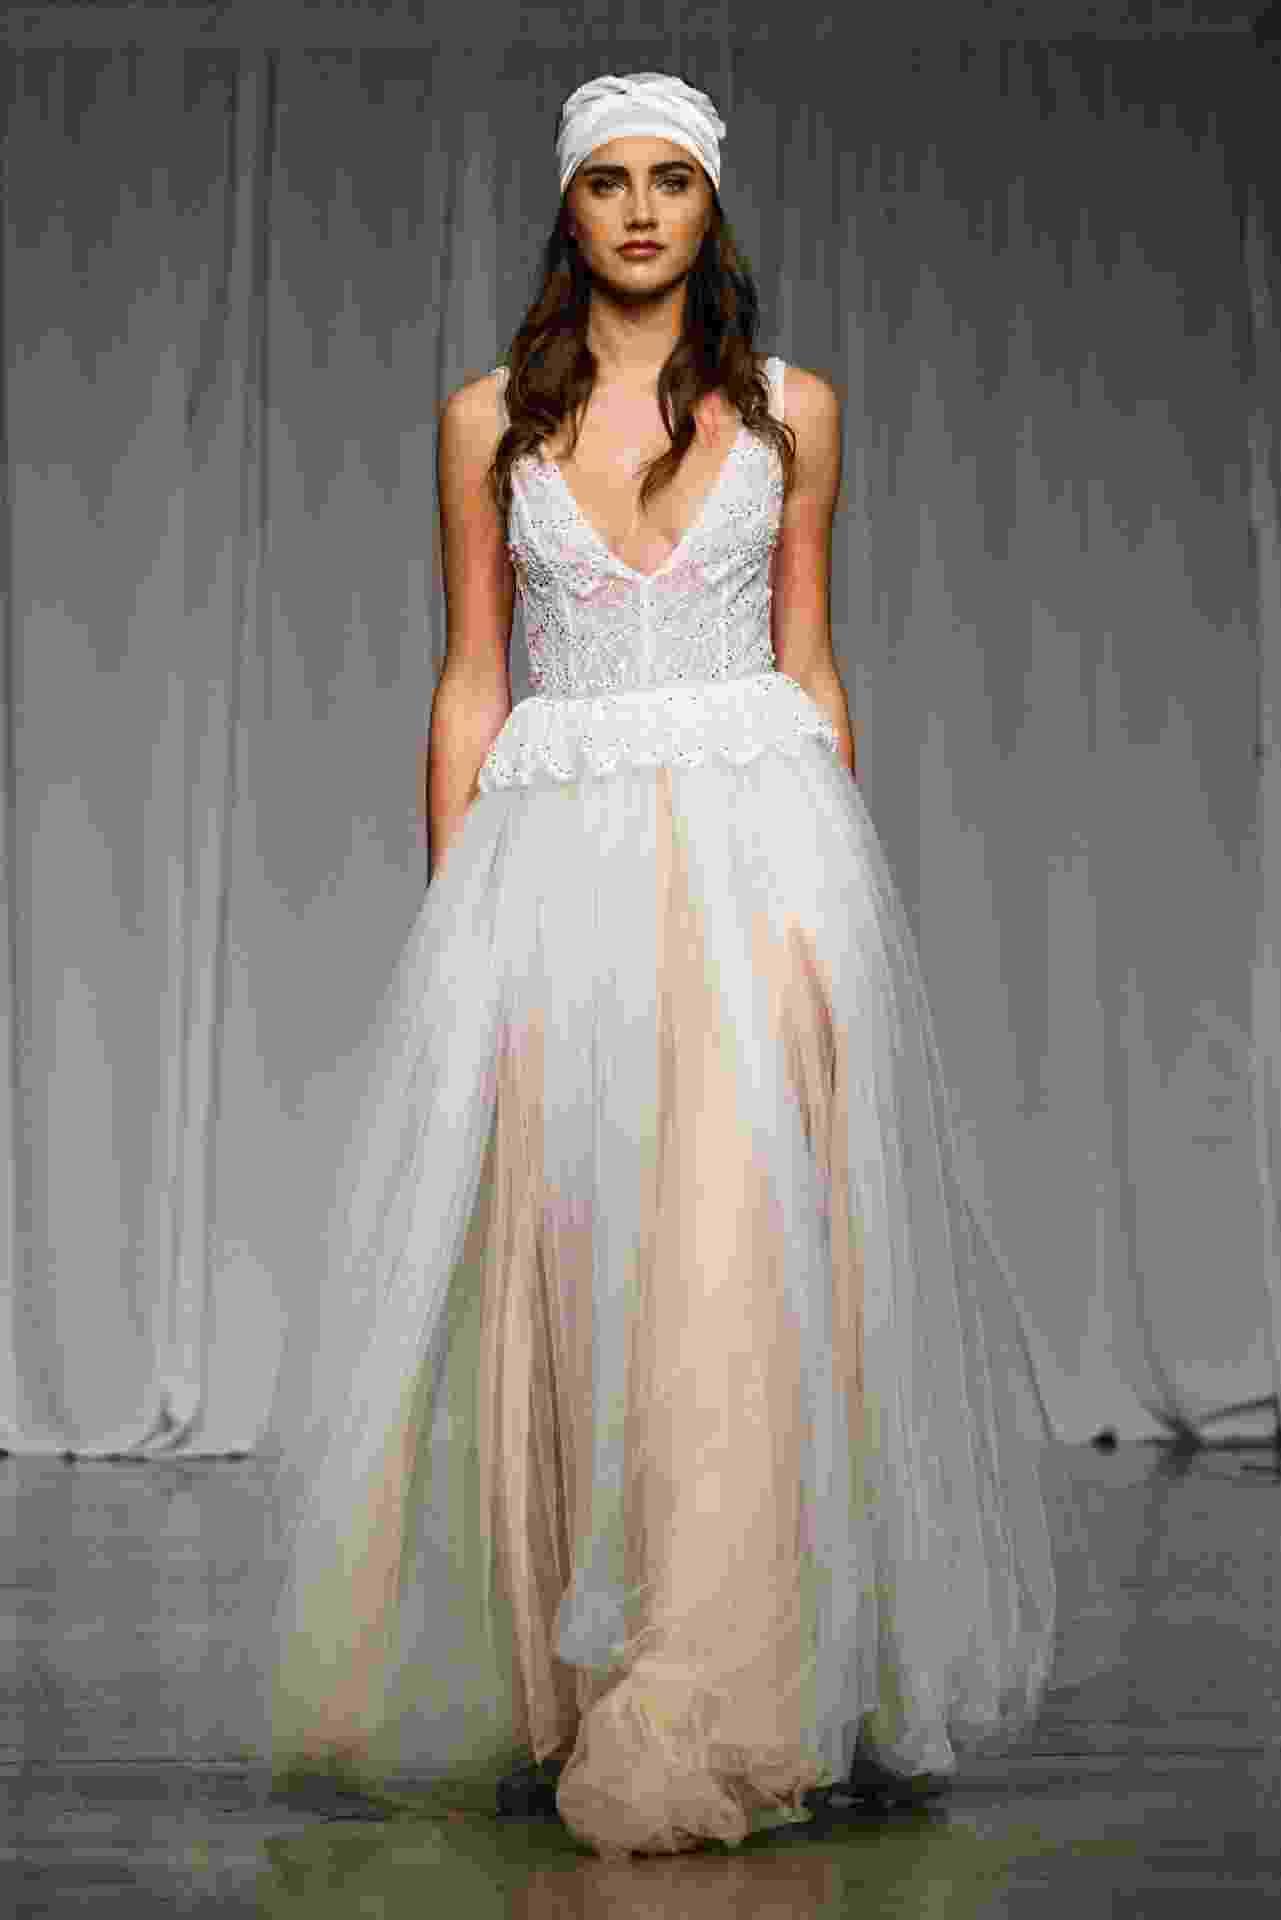 Bridal Fashion Week - Lilium - Xinhua/Lin Bilin